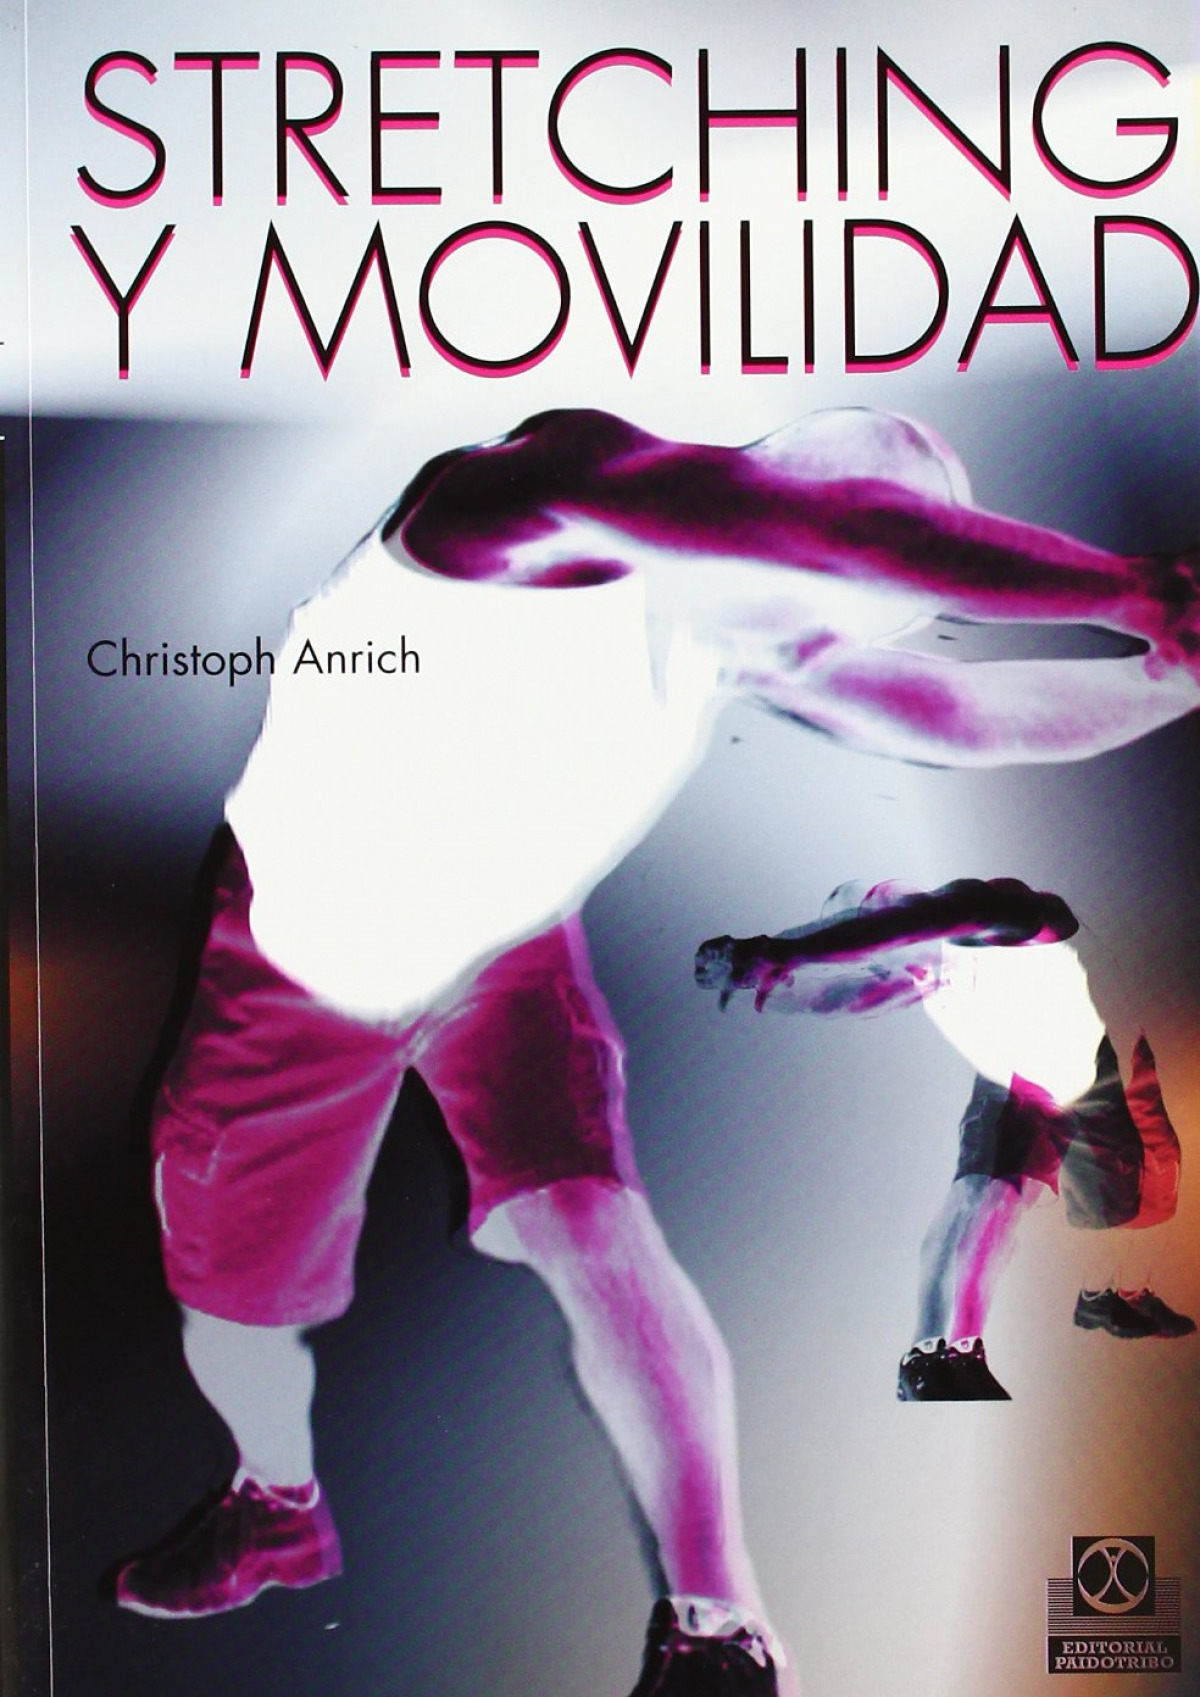 Stretching y movilidad - Anrich, Christoph